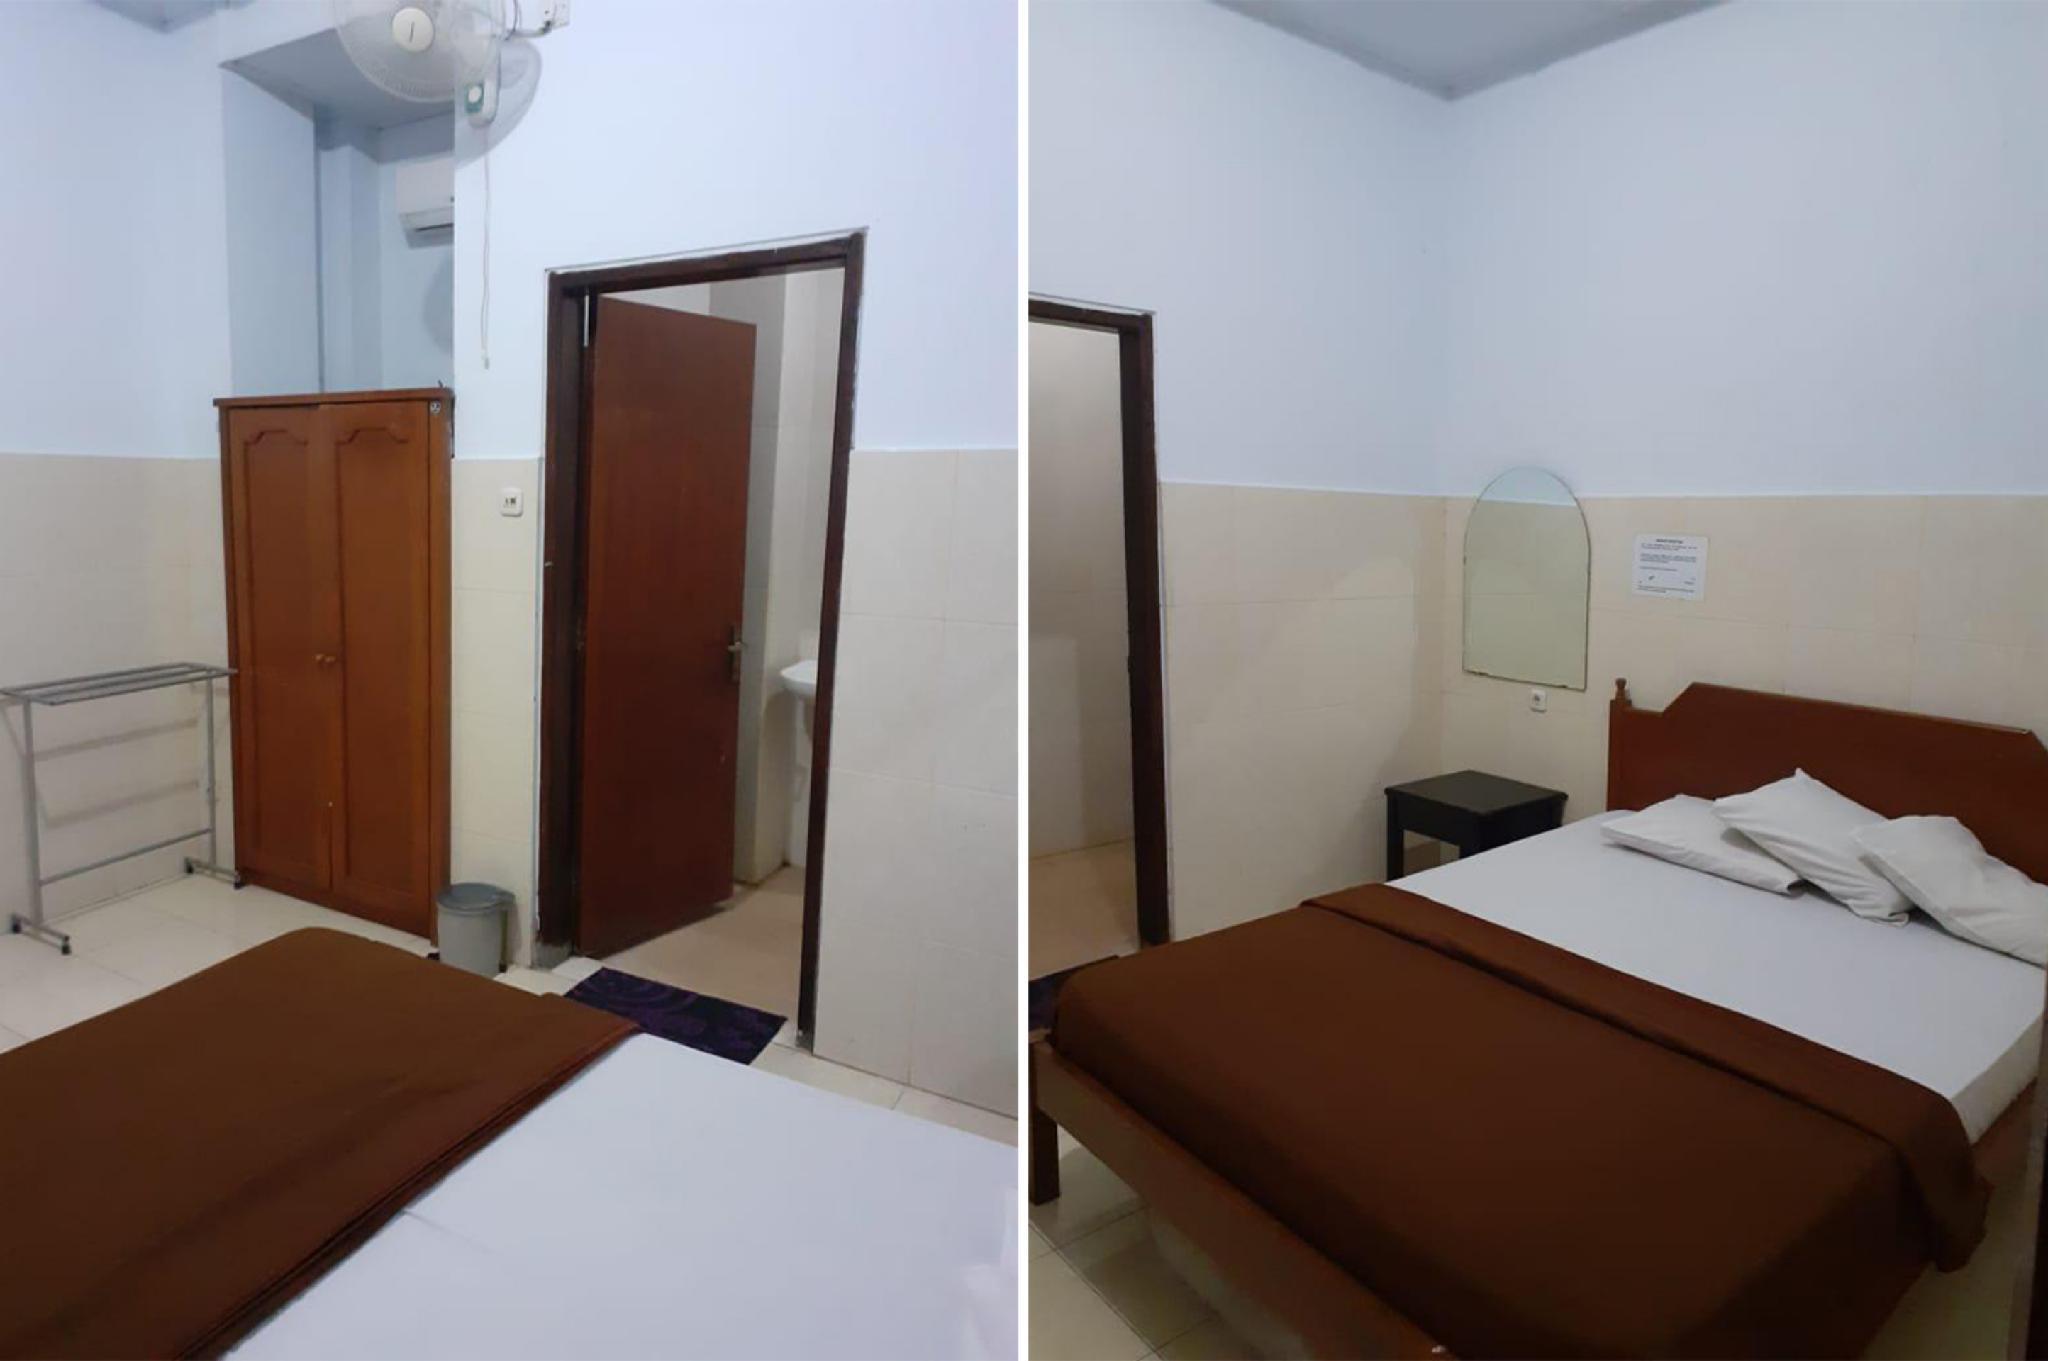 OYO 2129 Toar House Manado